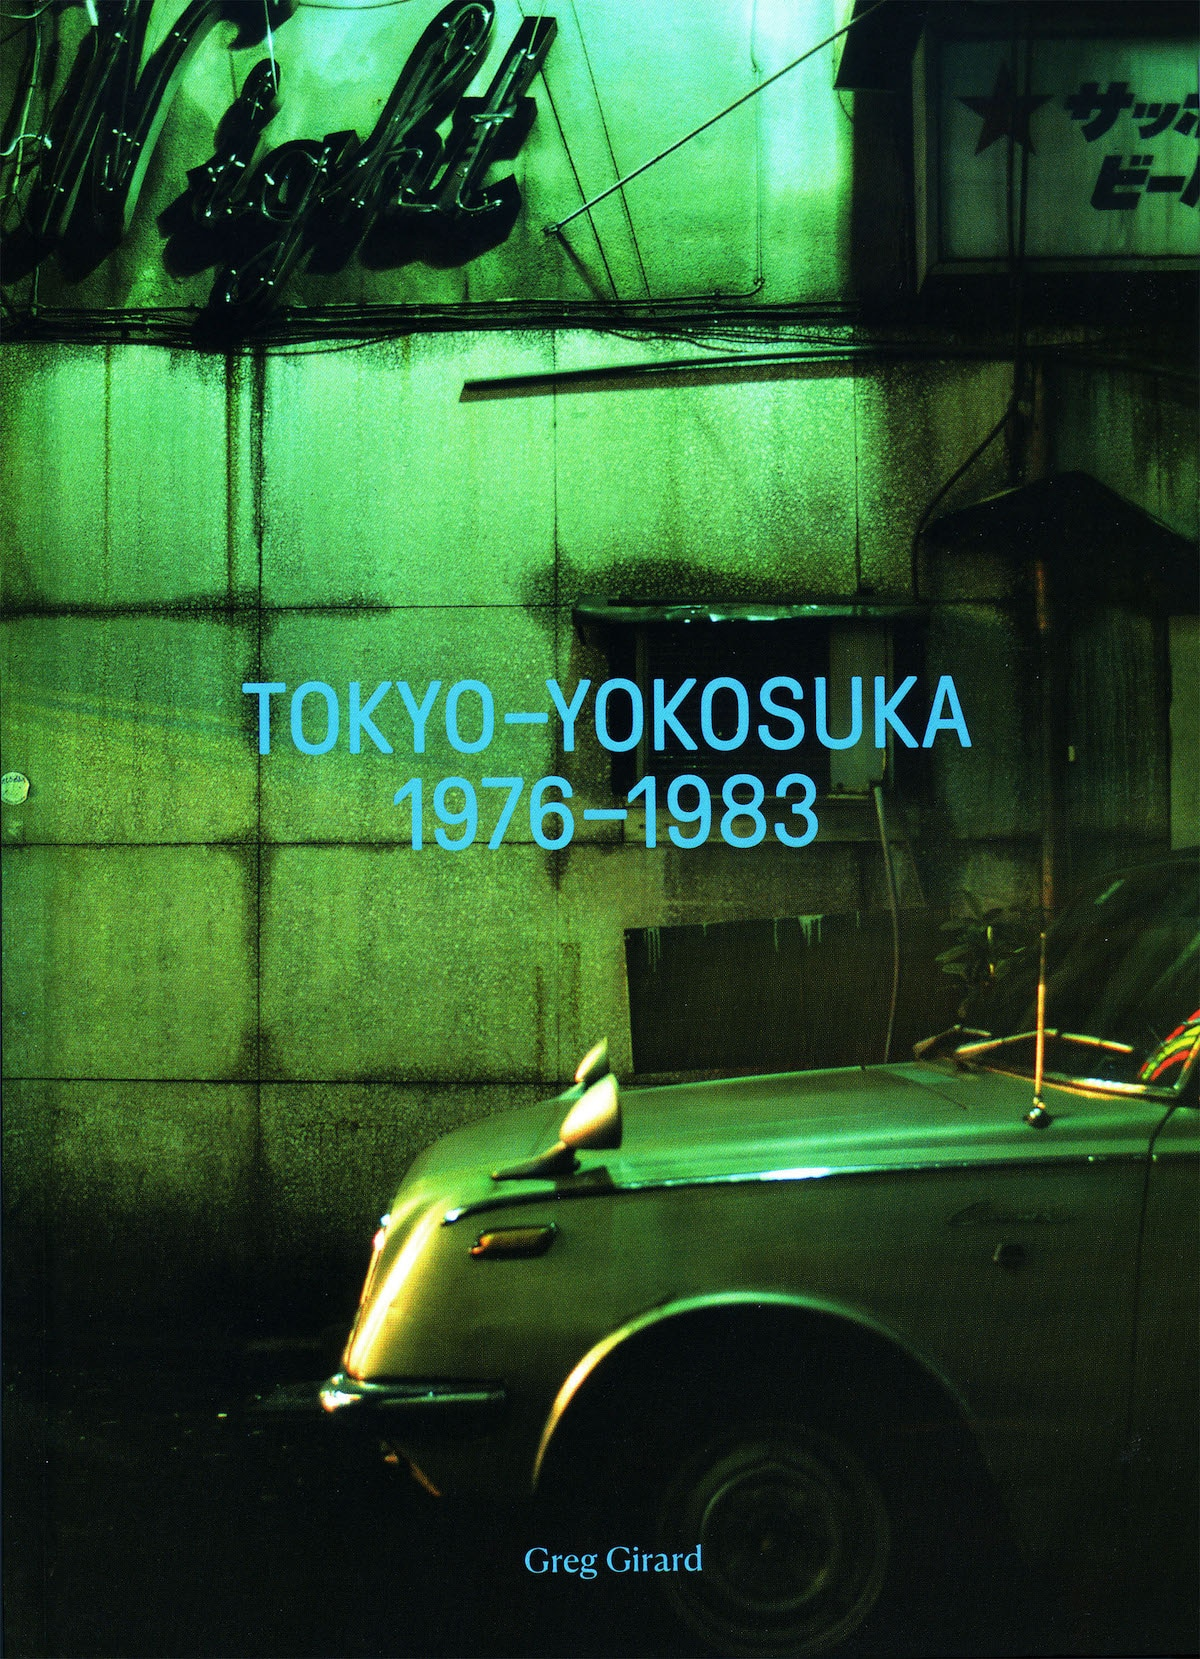 Tokyo-Yokosuka 1976-1983 by Greg Girard